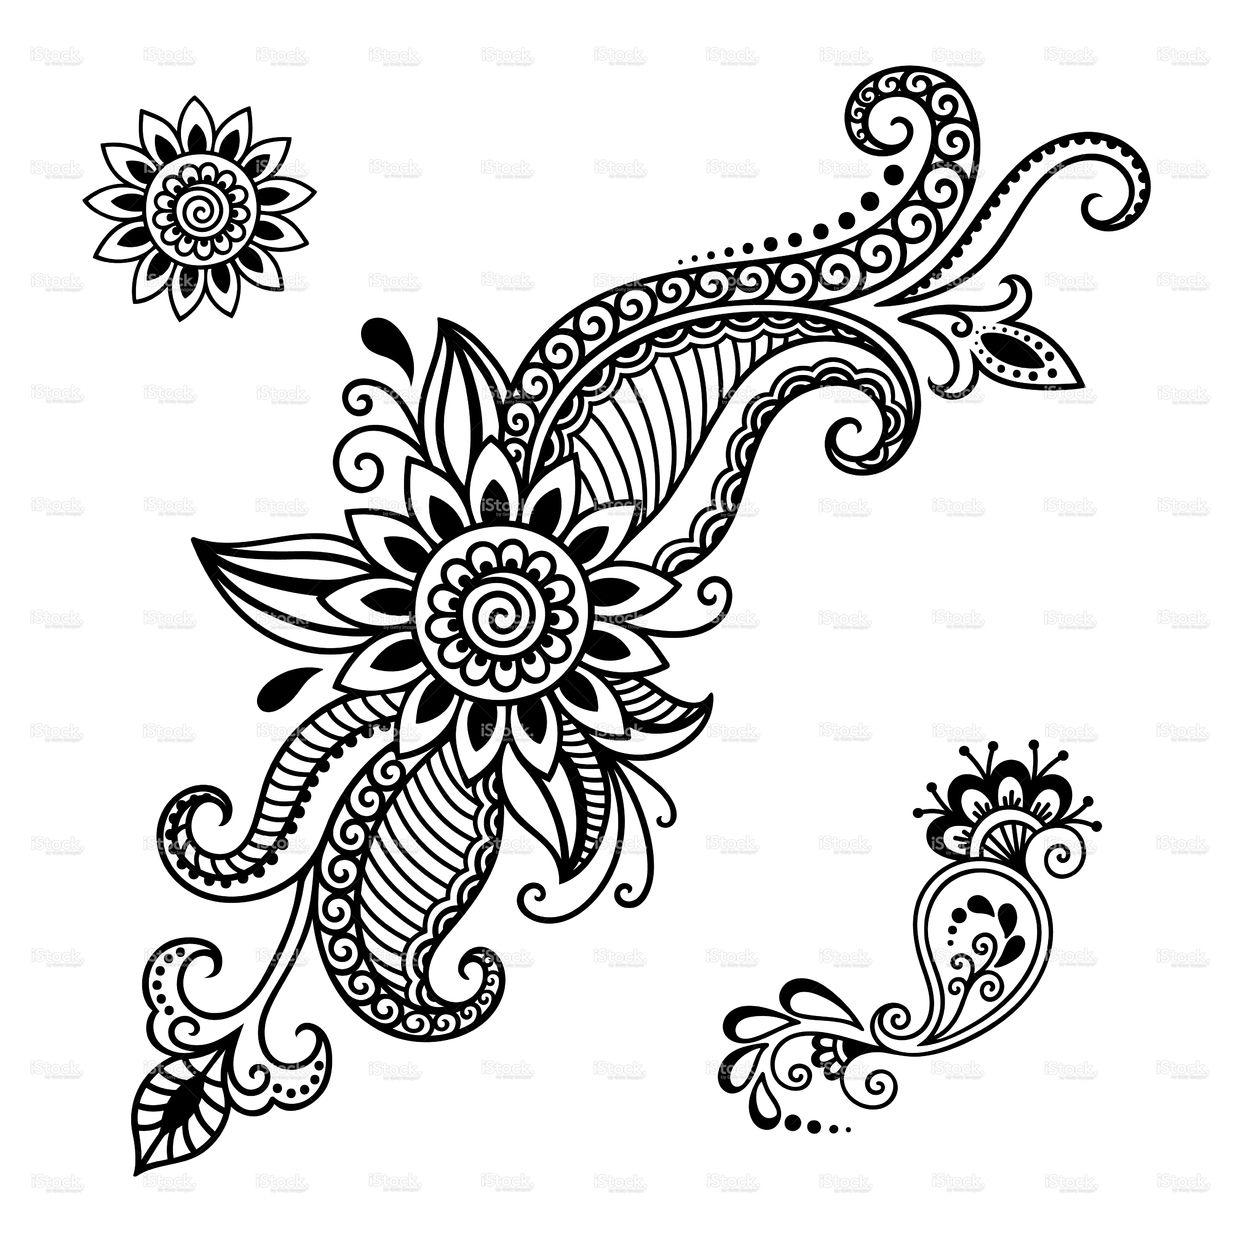 Mehndi Patterns Templates : Henna tattoo flower template mehndi flowers